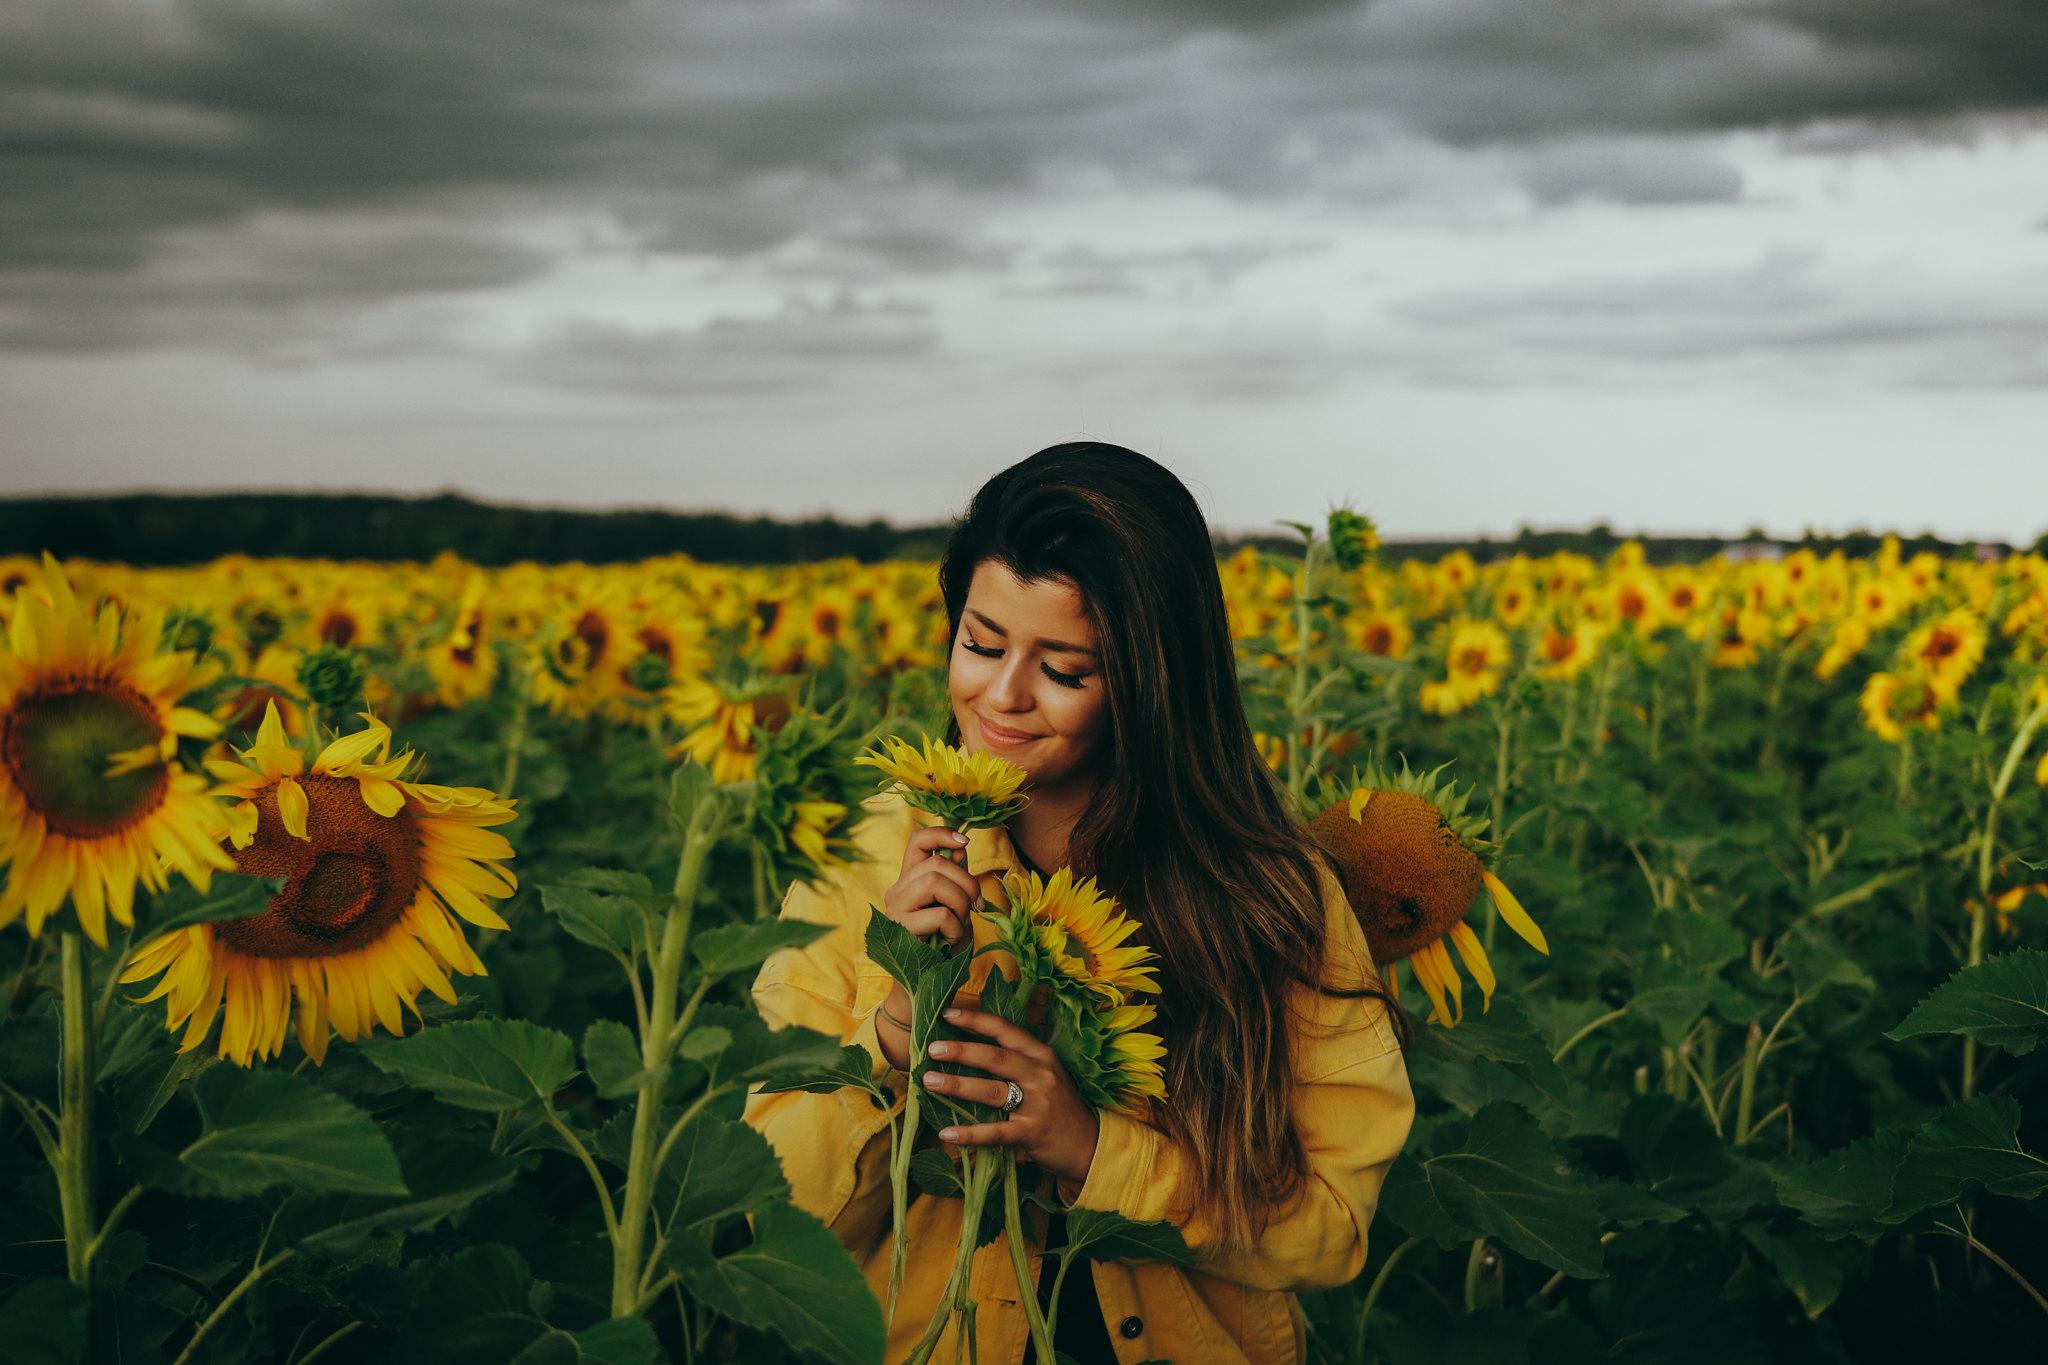 auringonkukkia-6